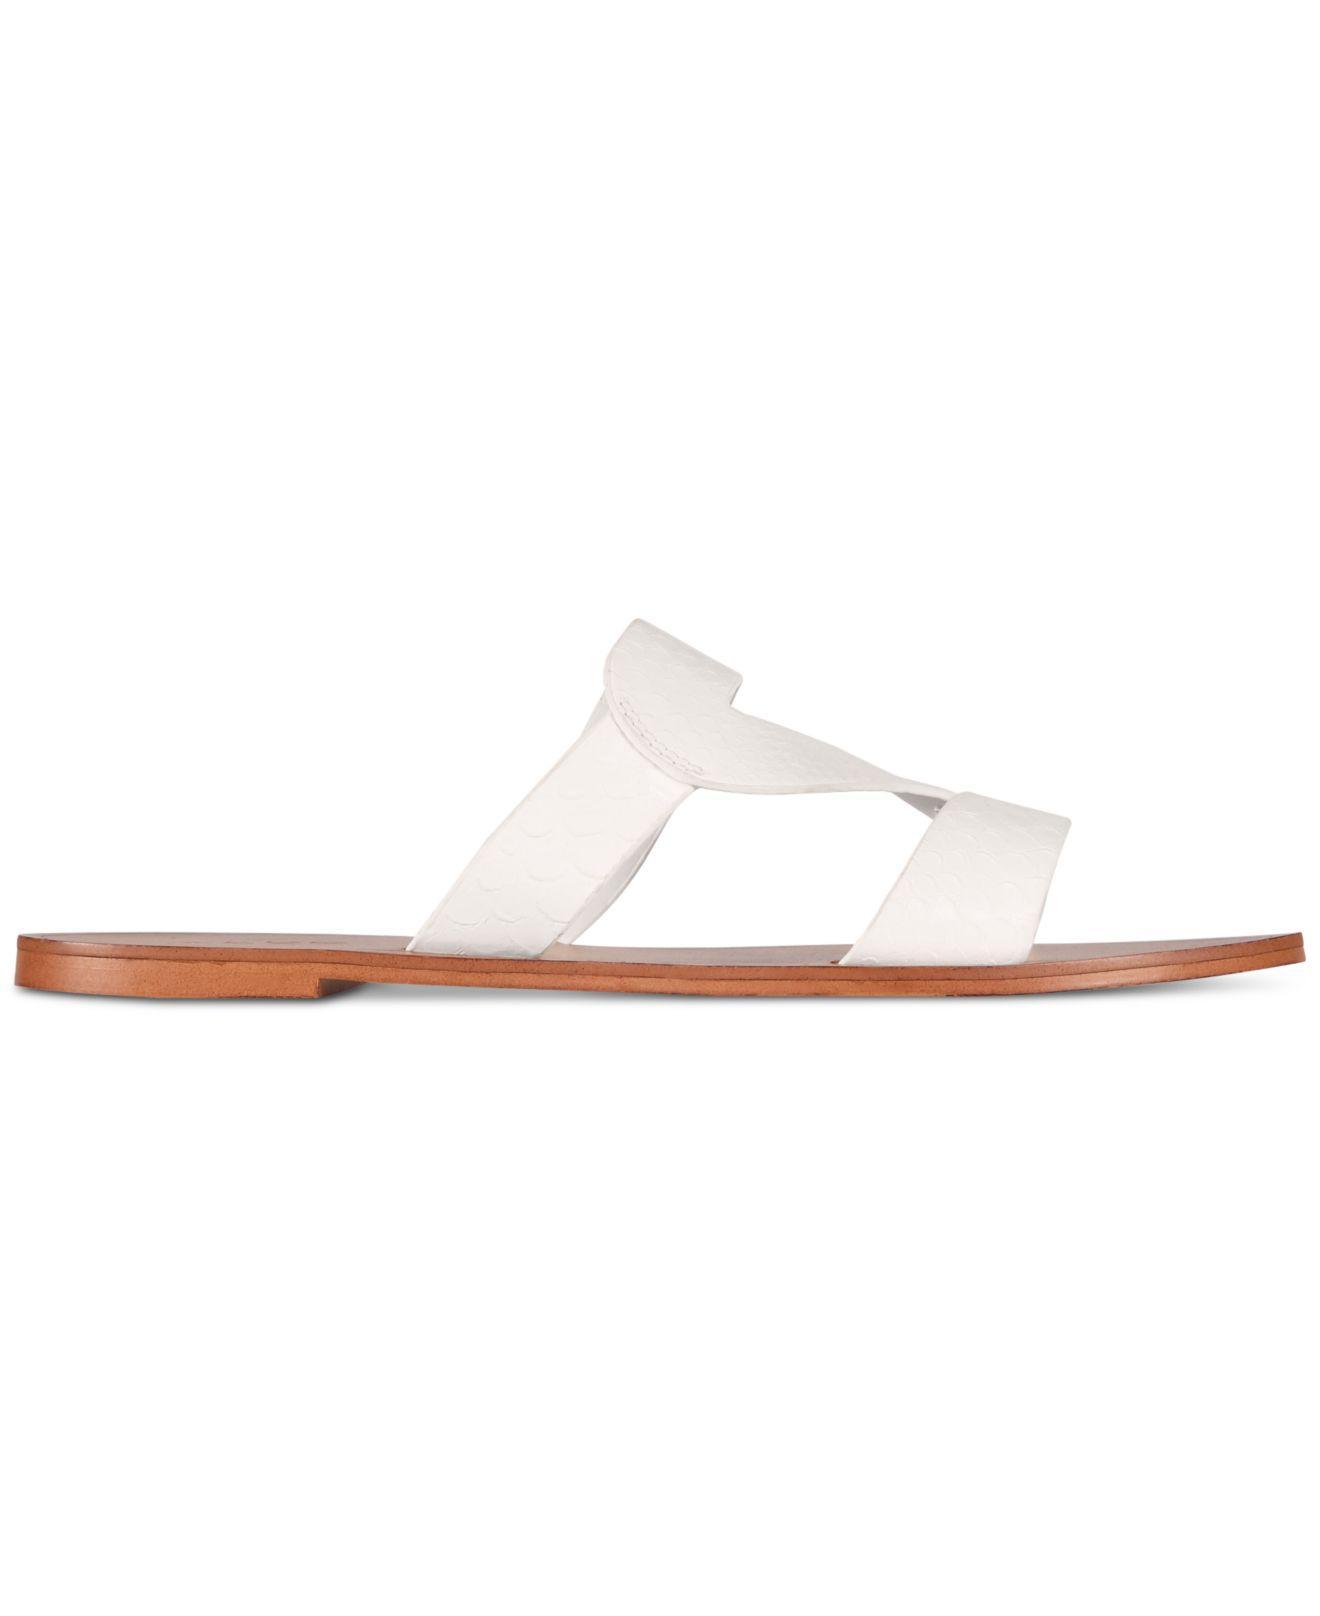 Women's Falema Flat Sandals Women's White White Falema wkZiTPXuO